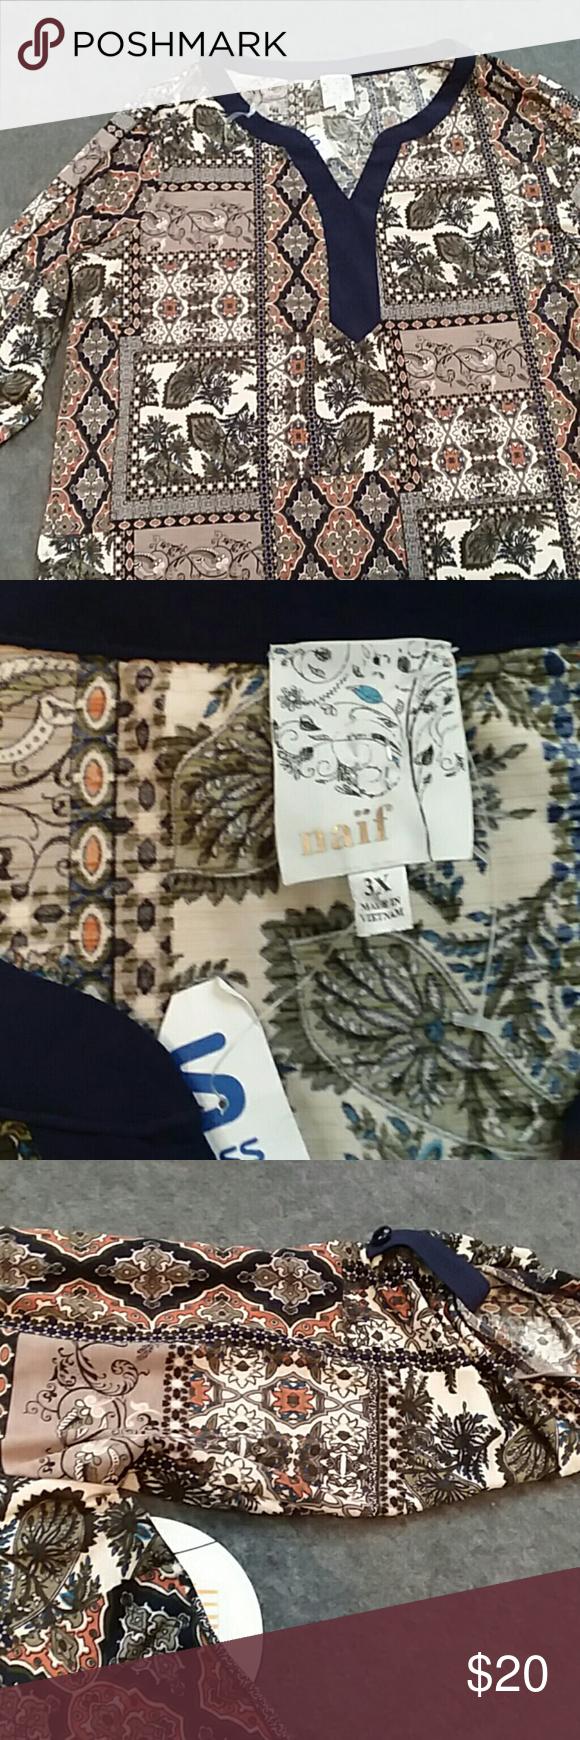 Naif printed top A 3x Naif printed top. Has loop and button on the sleeves. New with tags Naif Tops Blouses